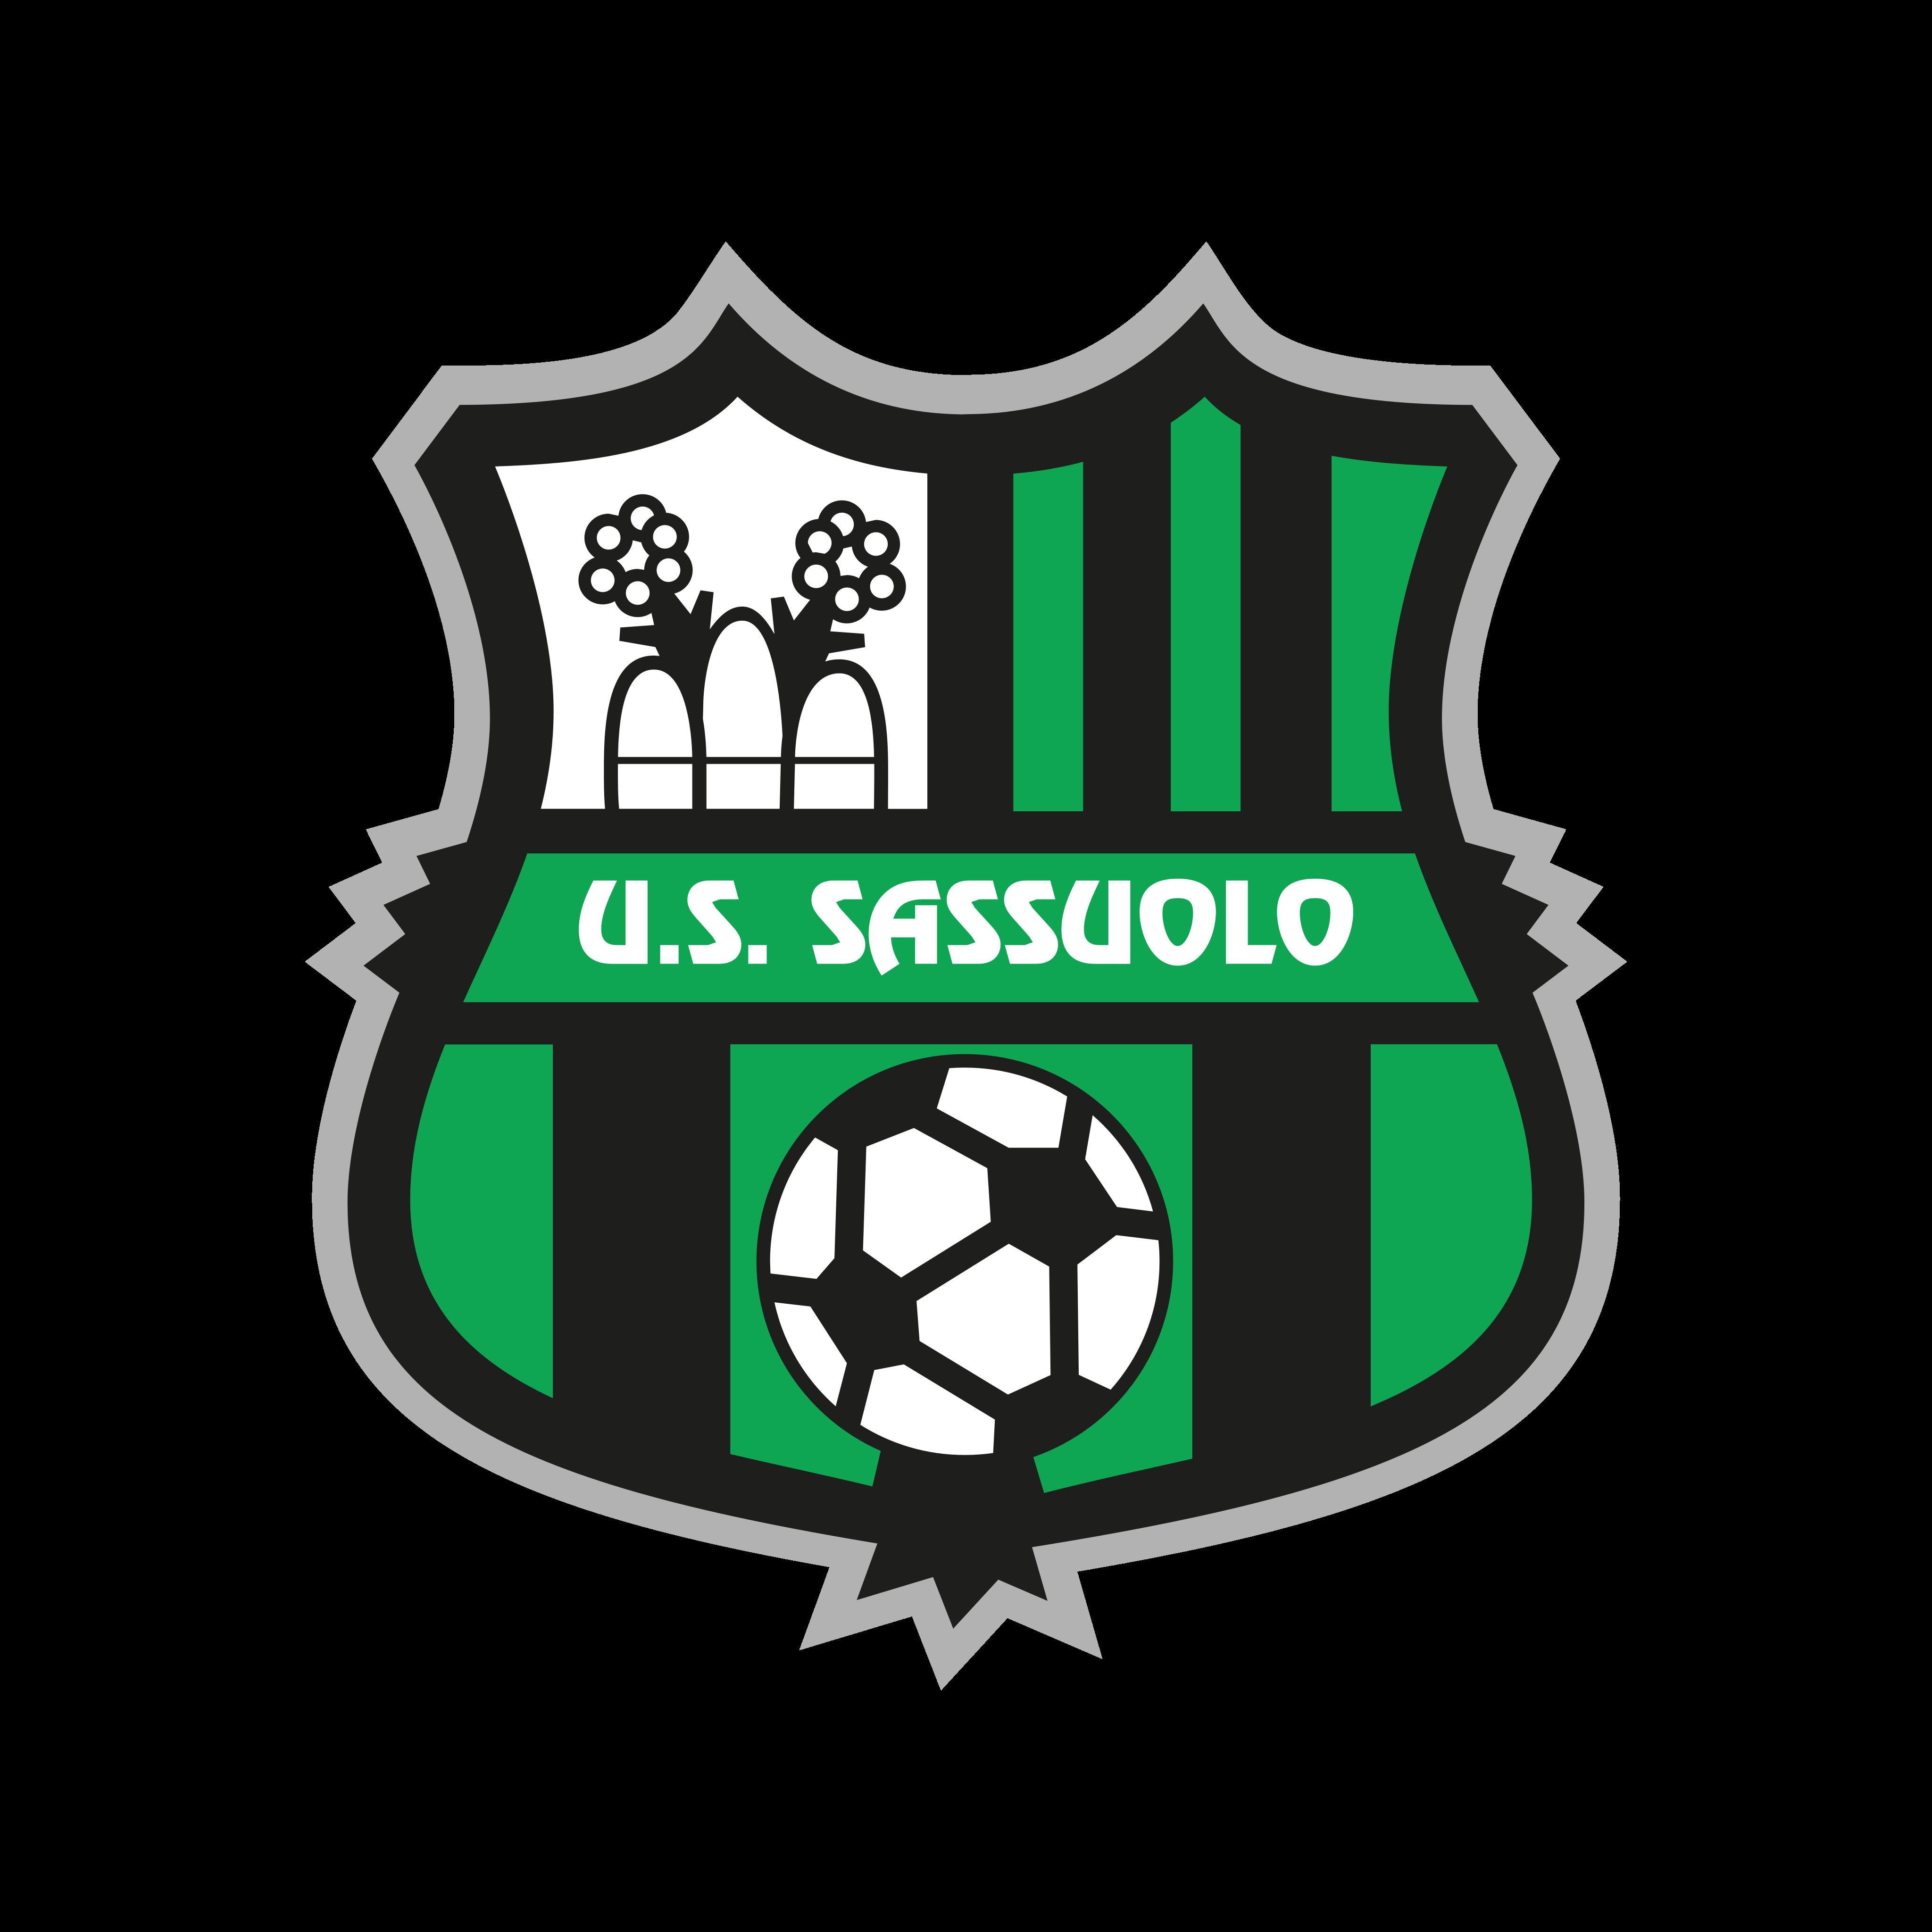 sassuolo calcio logo 0 - Sassuolo Calcio Logo